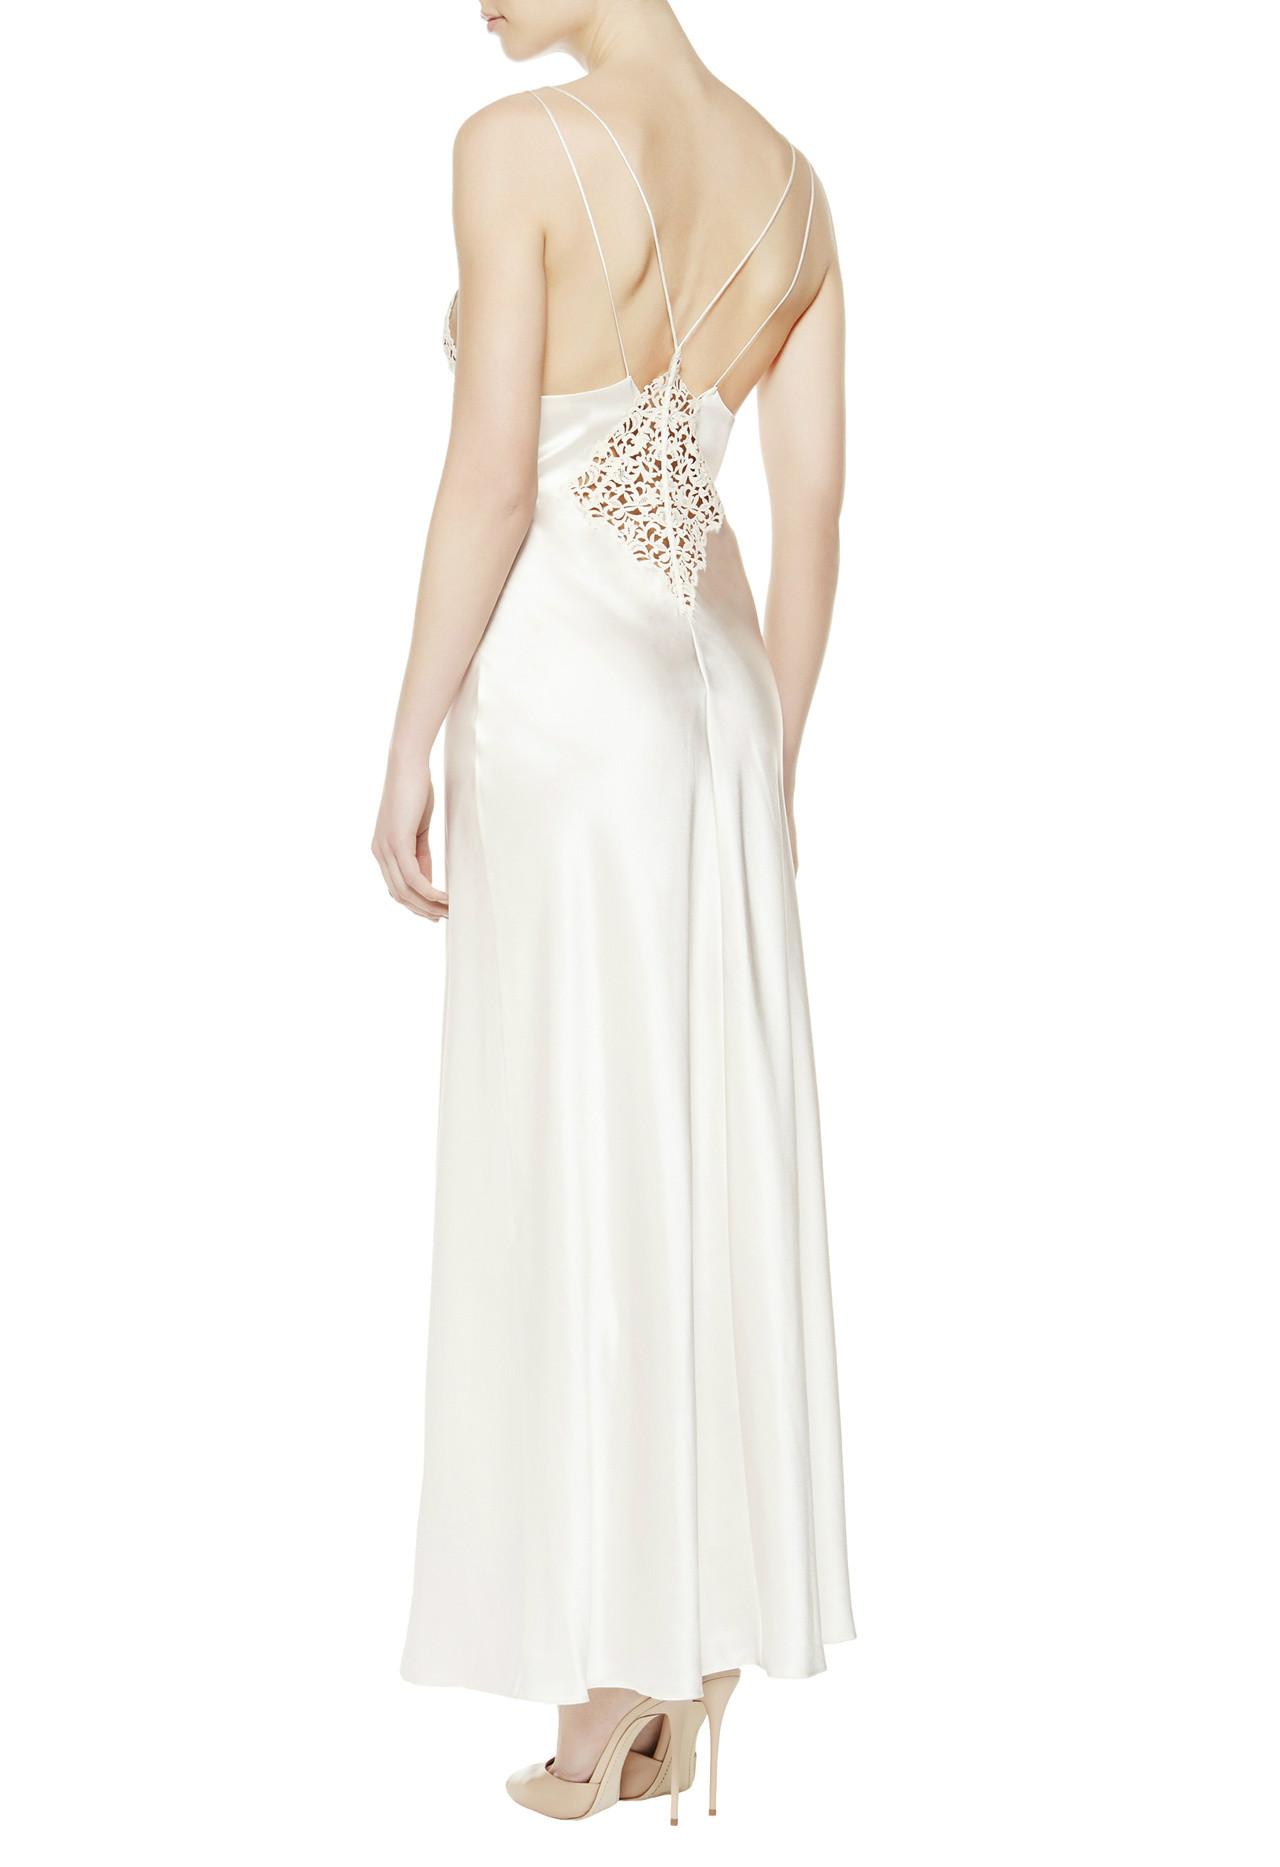 La Perla Petit Macrame long dress lingerie нижнее белье платье